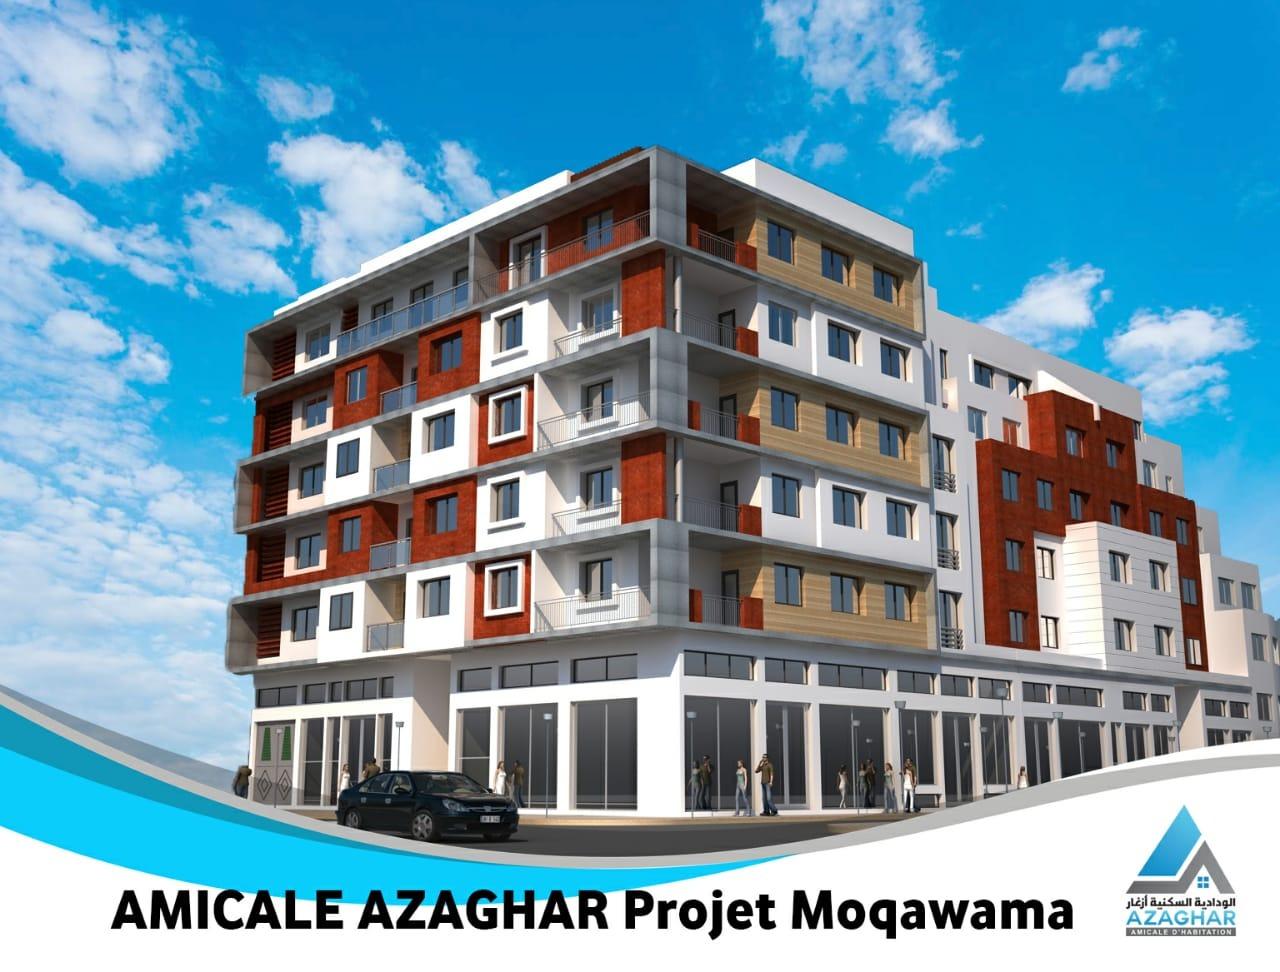 projet rue moqawama